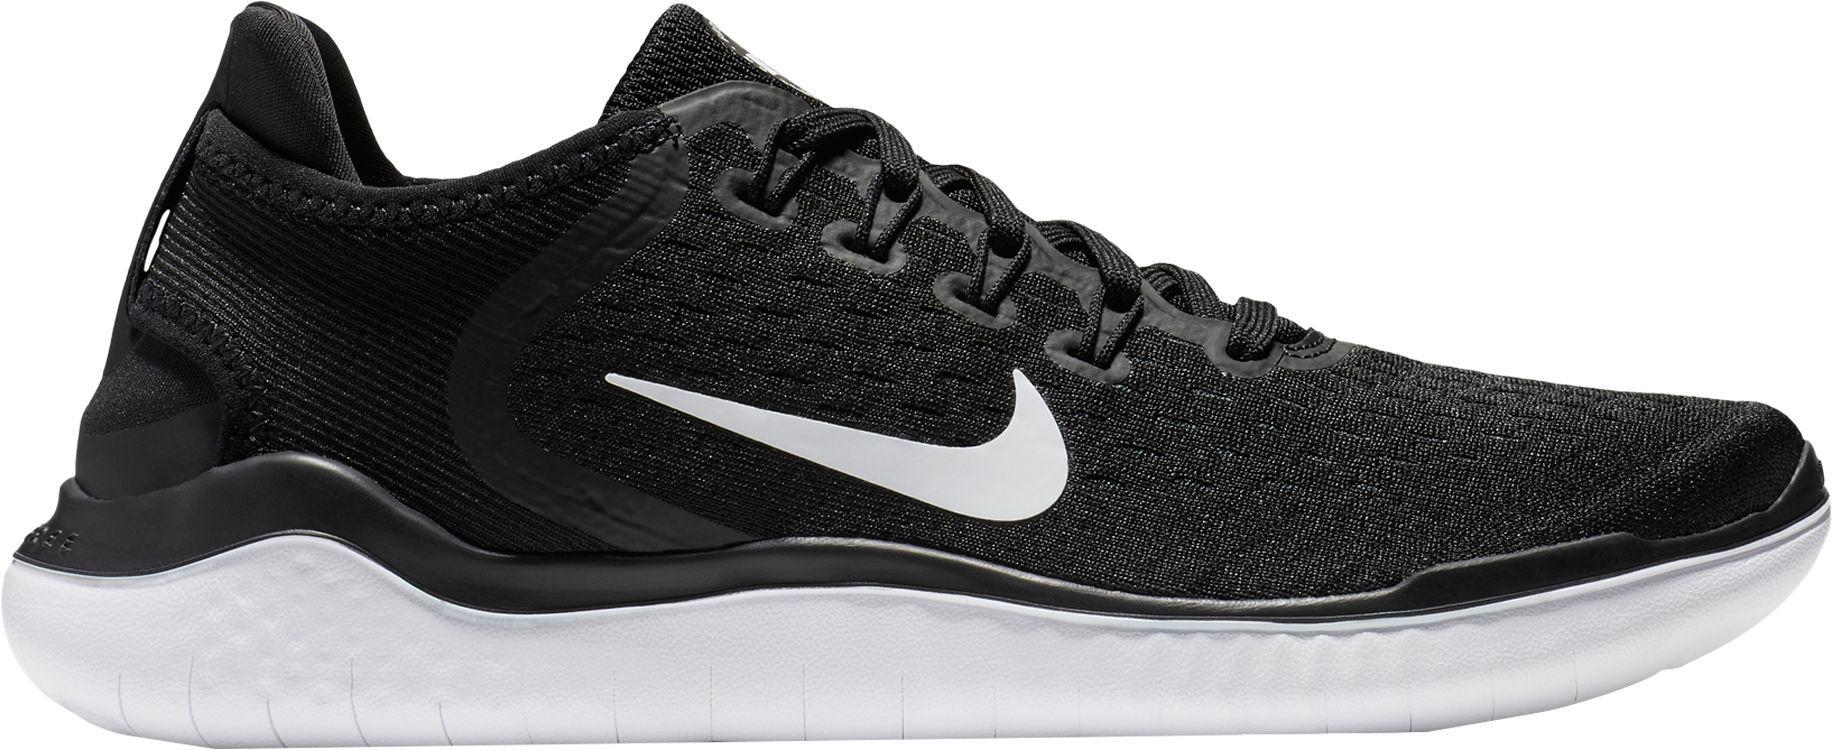 half off e8d8b a3bad Nike Women's Free RN 2018 Running Shoes | Favorites ...